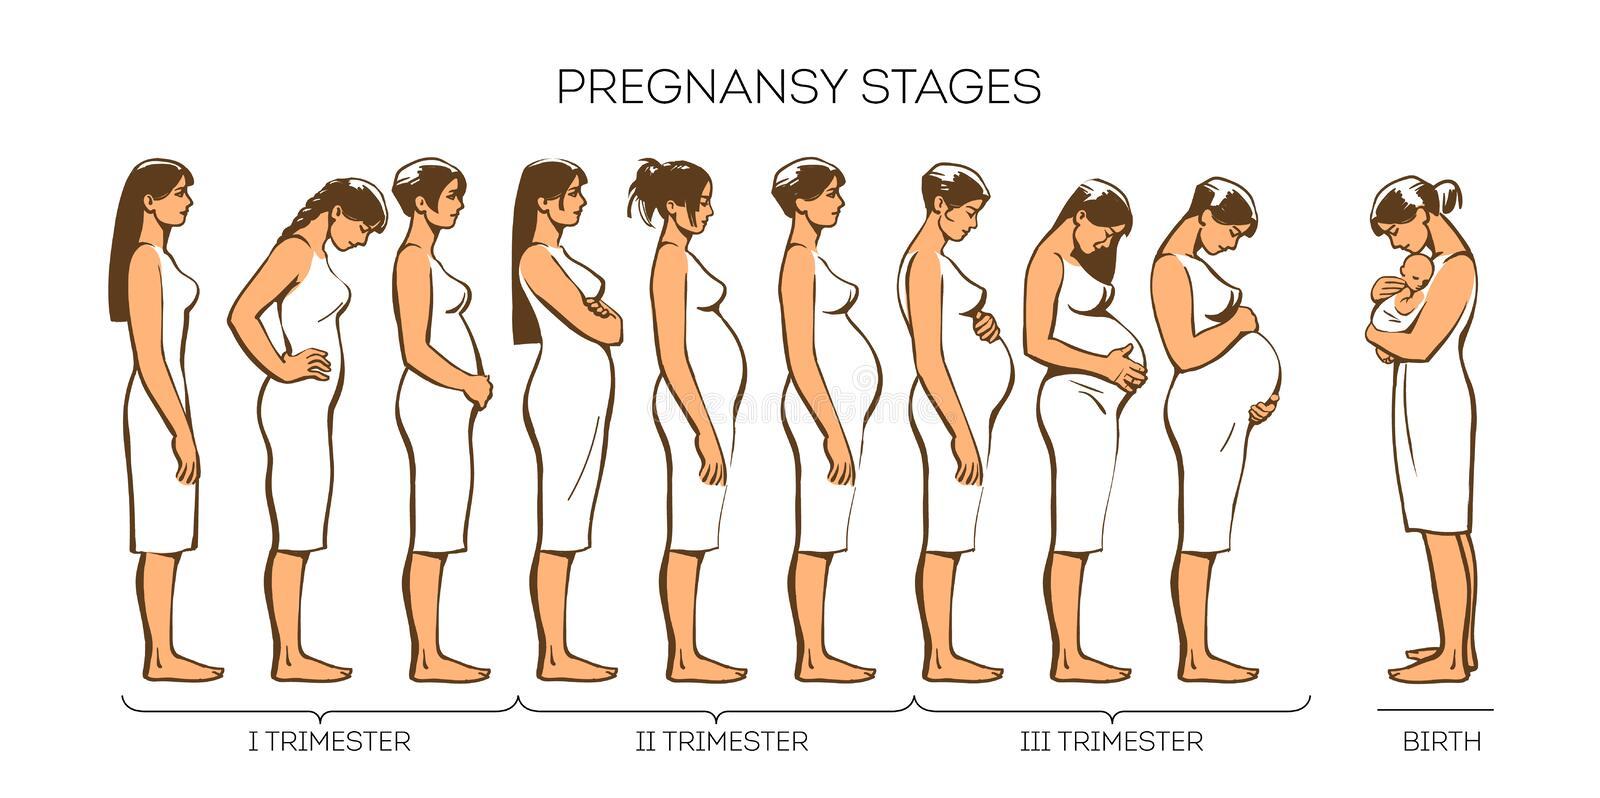 women pregnancy stages vector image pregnant woman motherhood trimester nine months 68849297